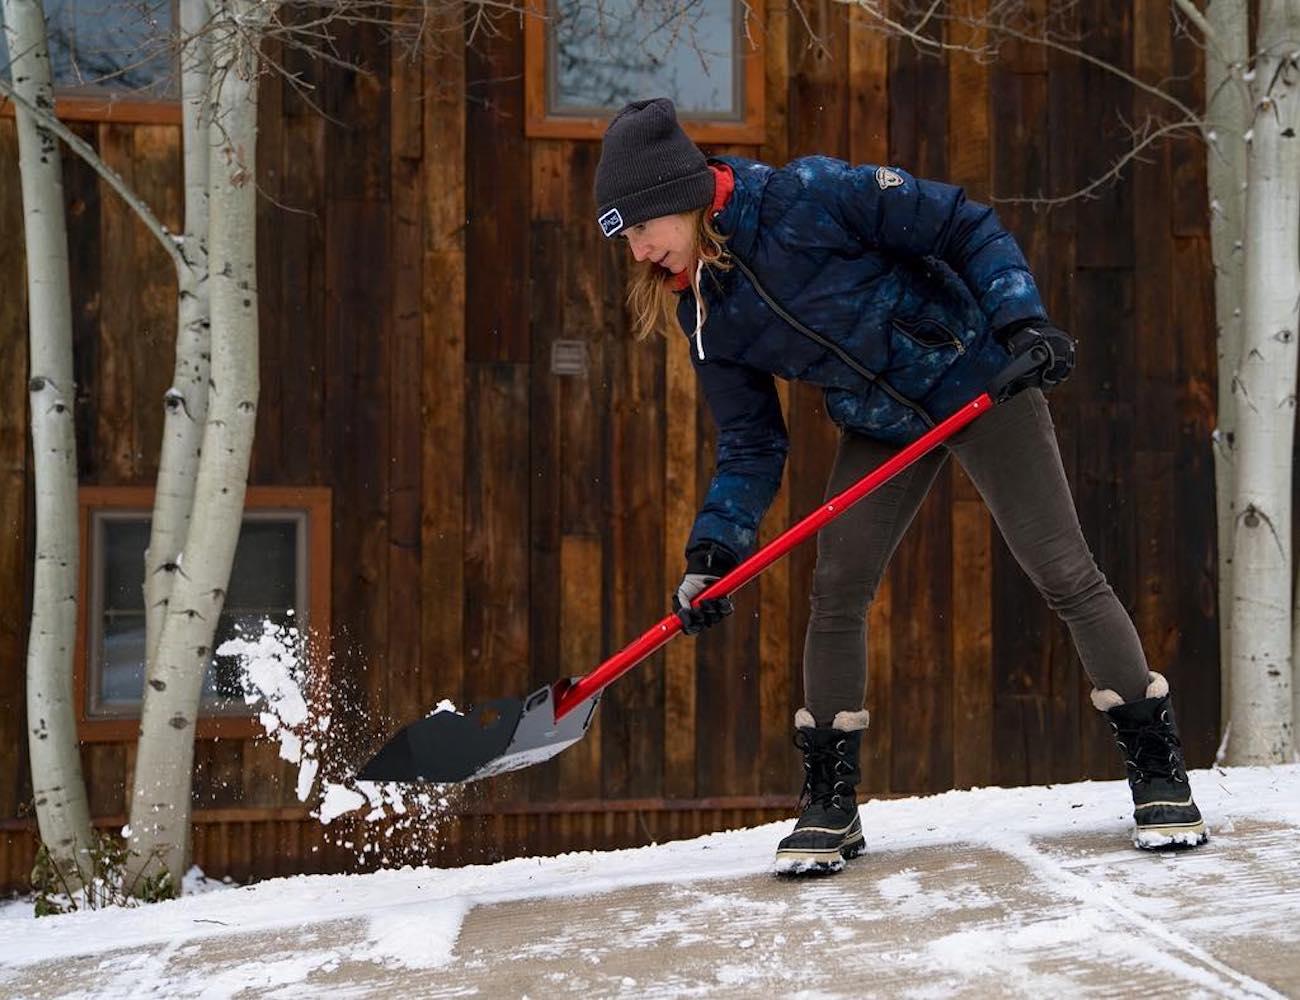 DMOS Alpha All-Terrain Dirt and Snow Shovel